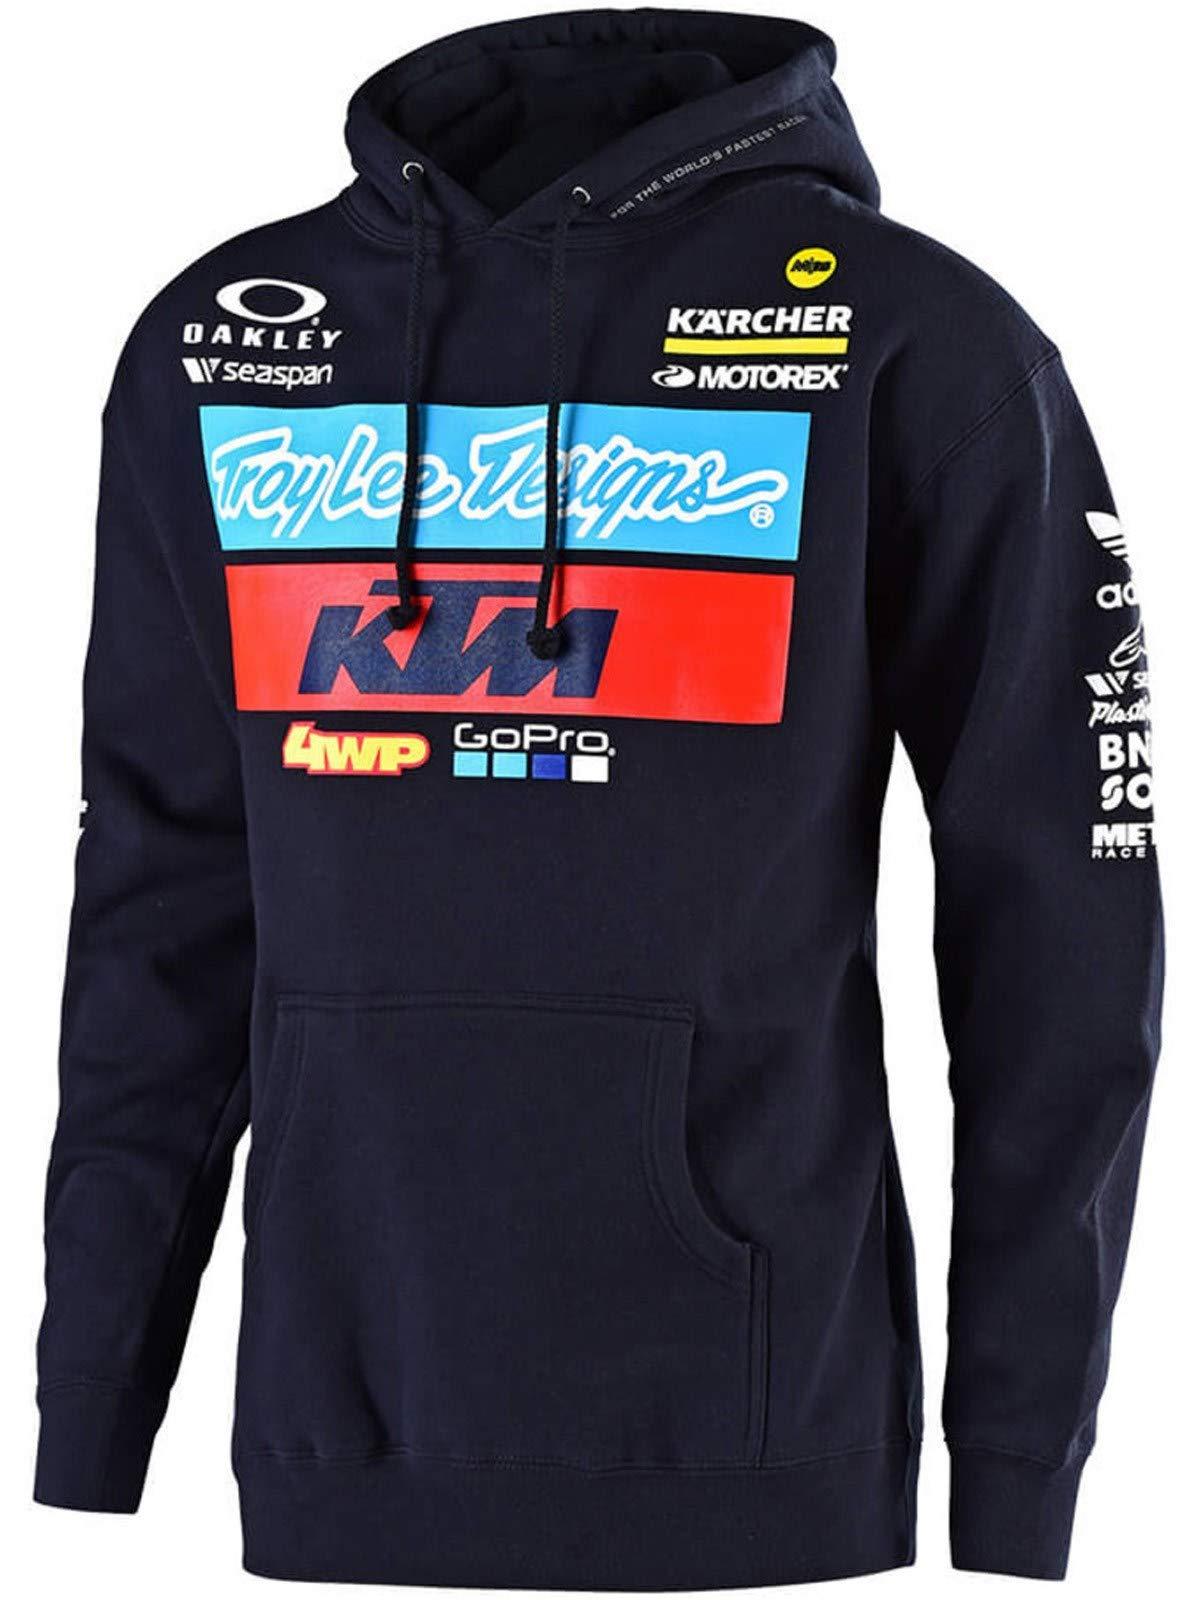 Troy Lee Designs 2019 Youth KTM Team Hoody (Small)